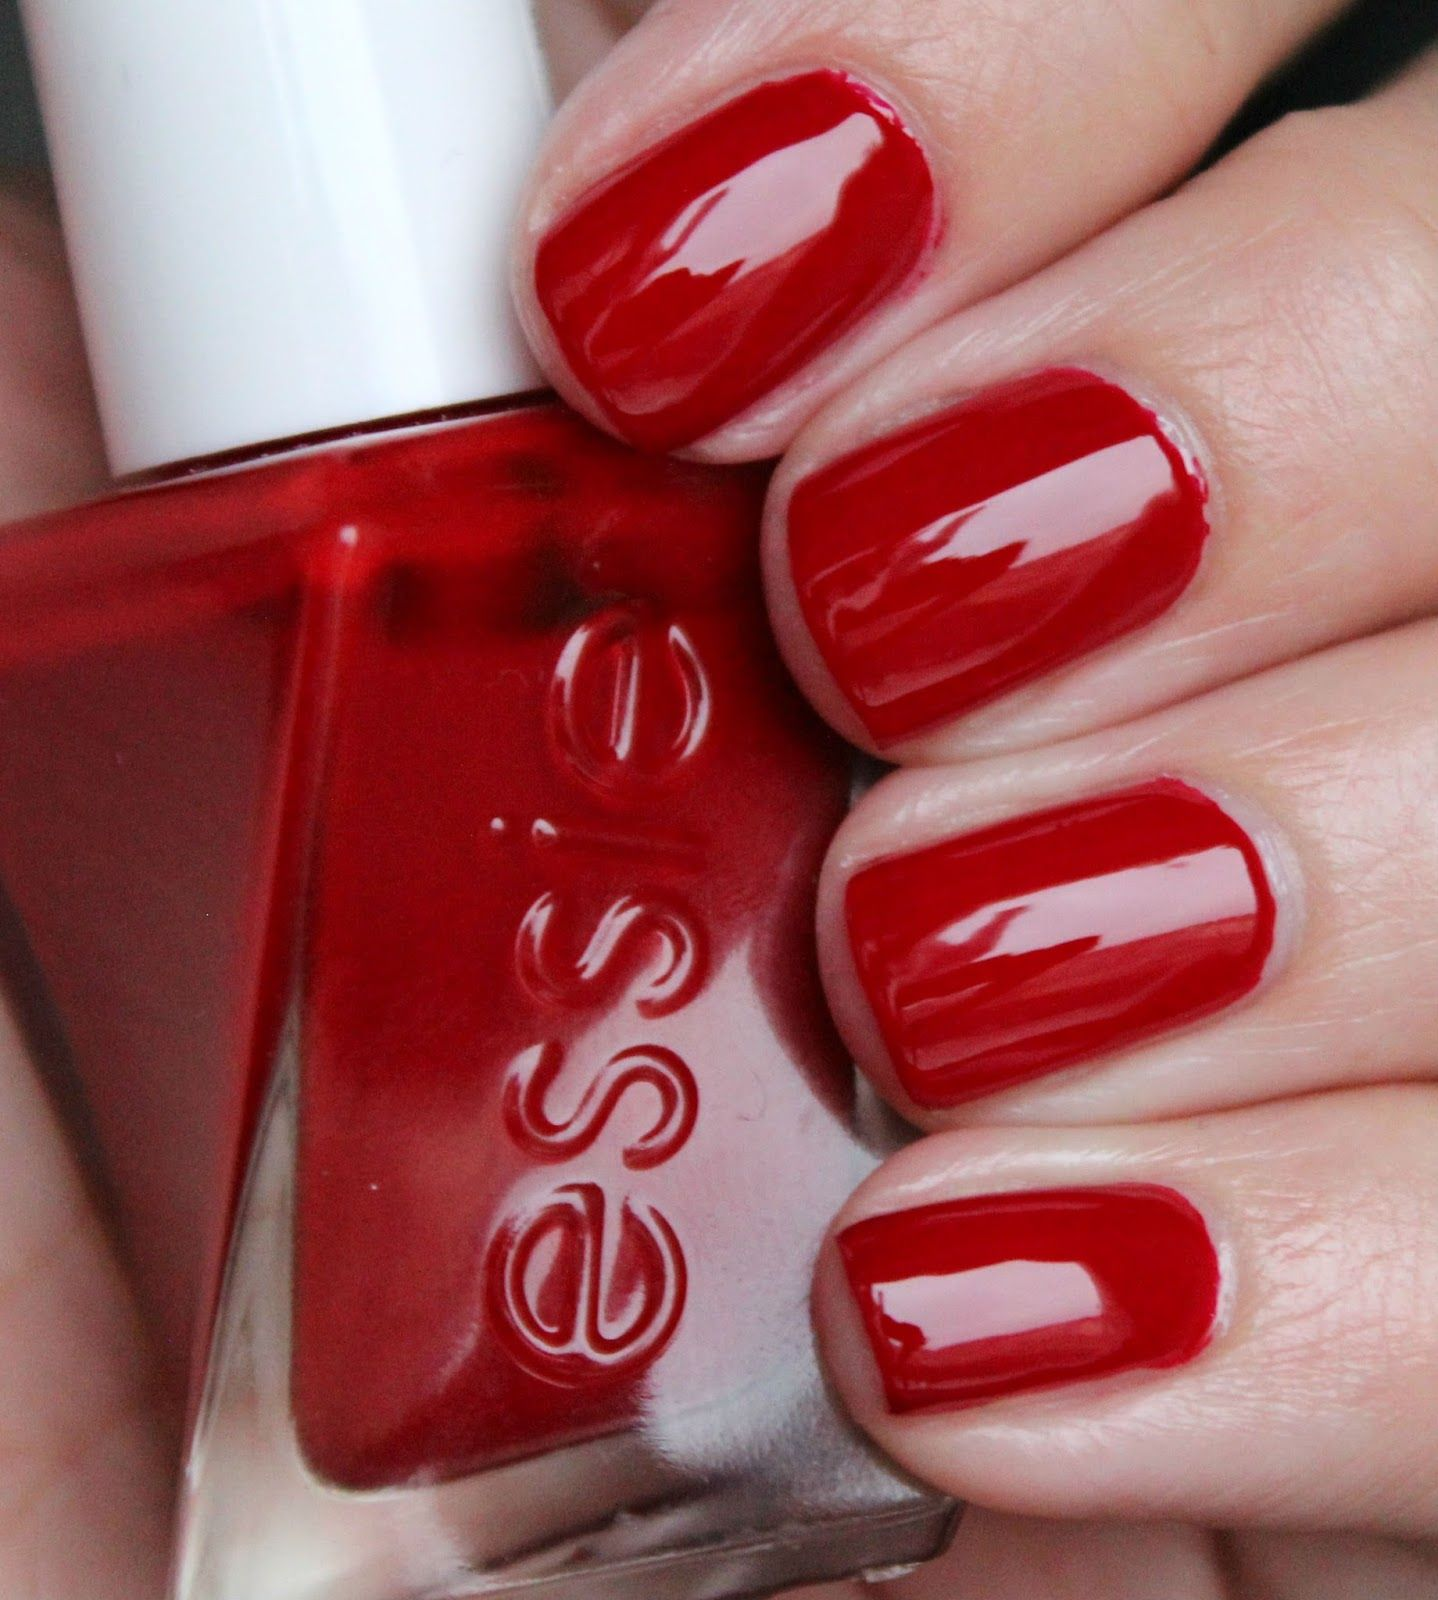 Essie Gel Couture - Bubbles Only | Nails | Pinterest | Essie gel ...